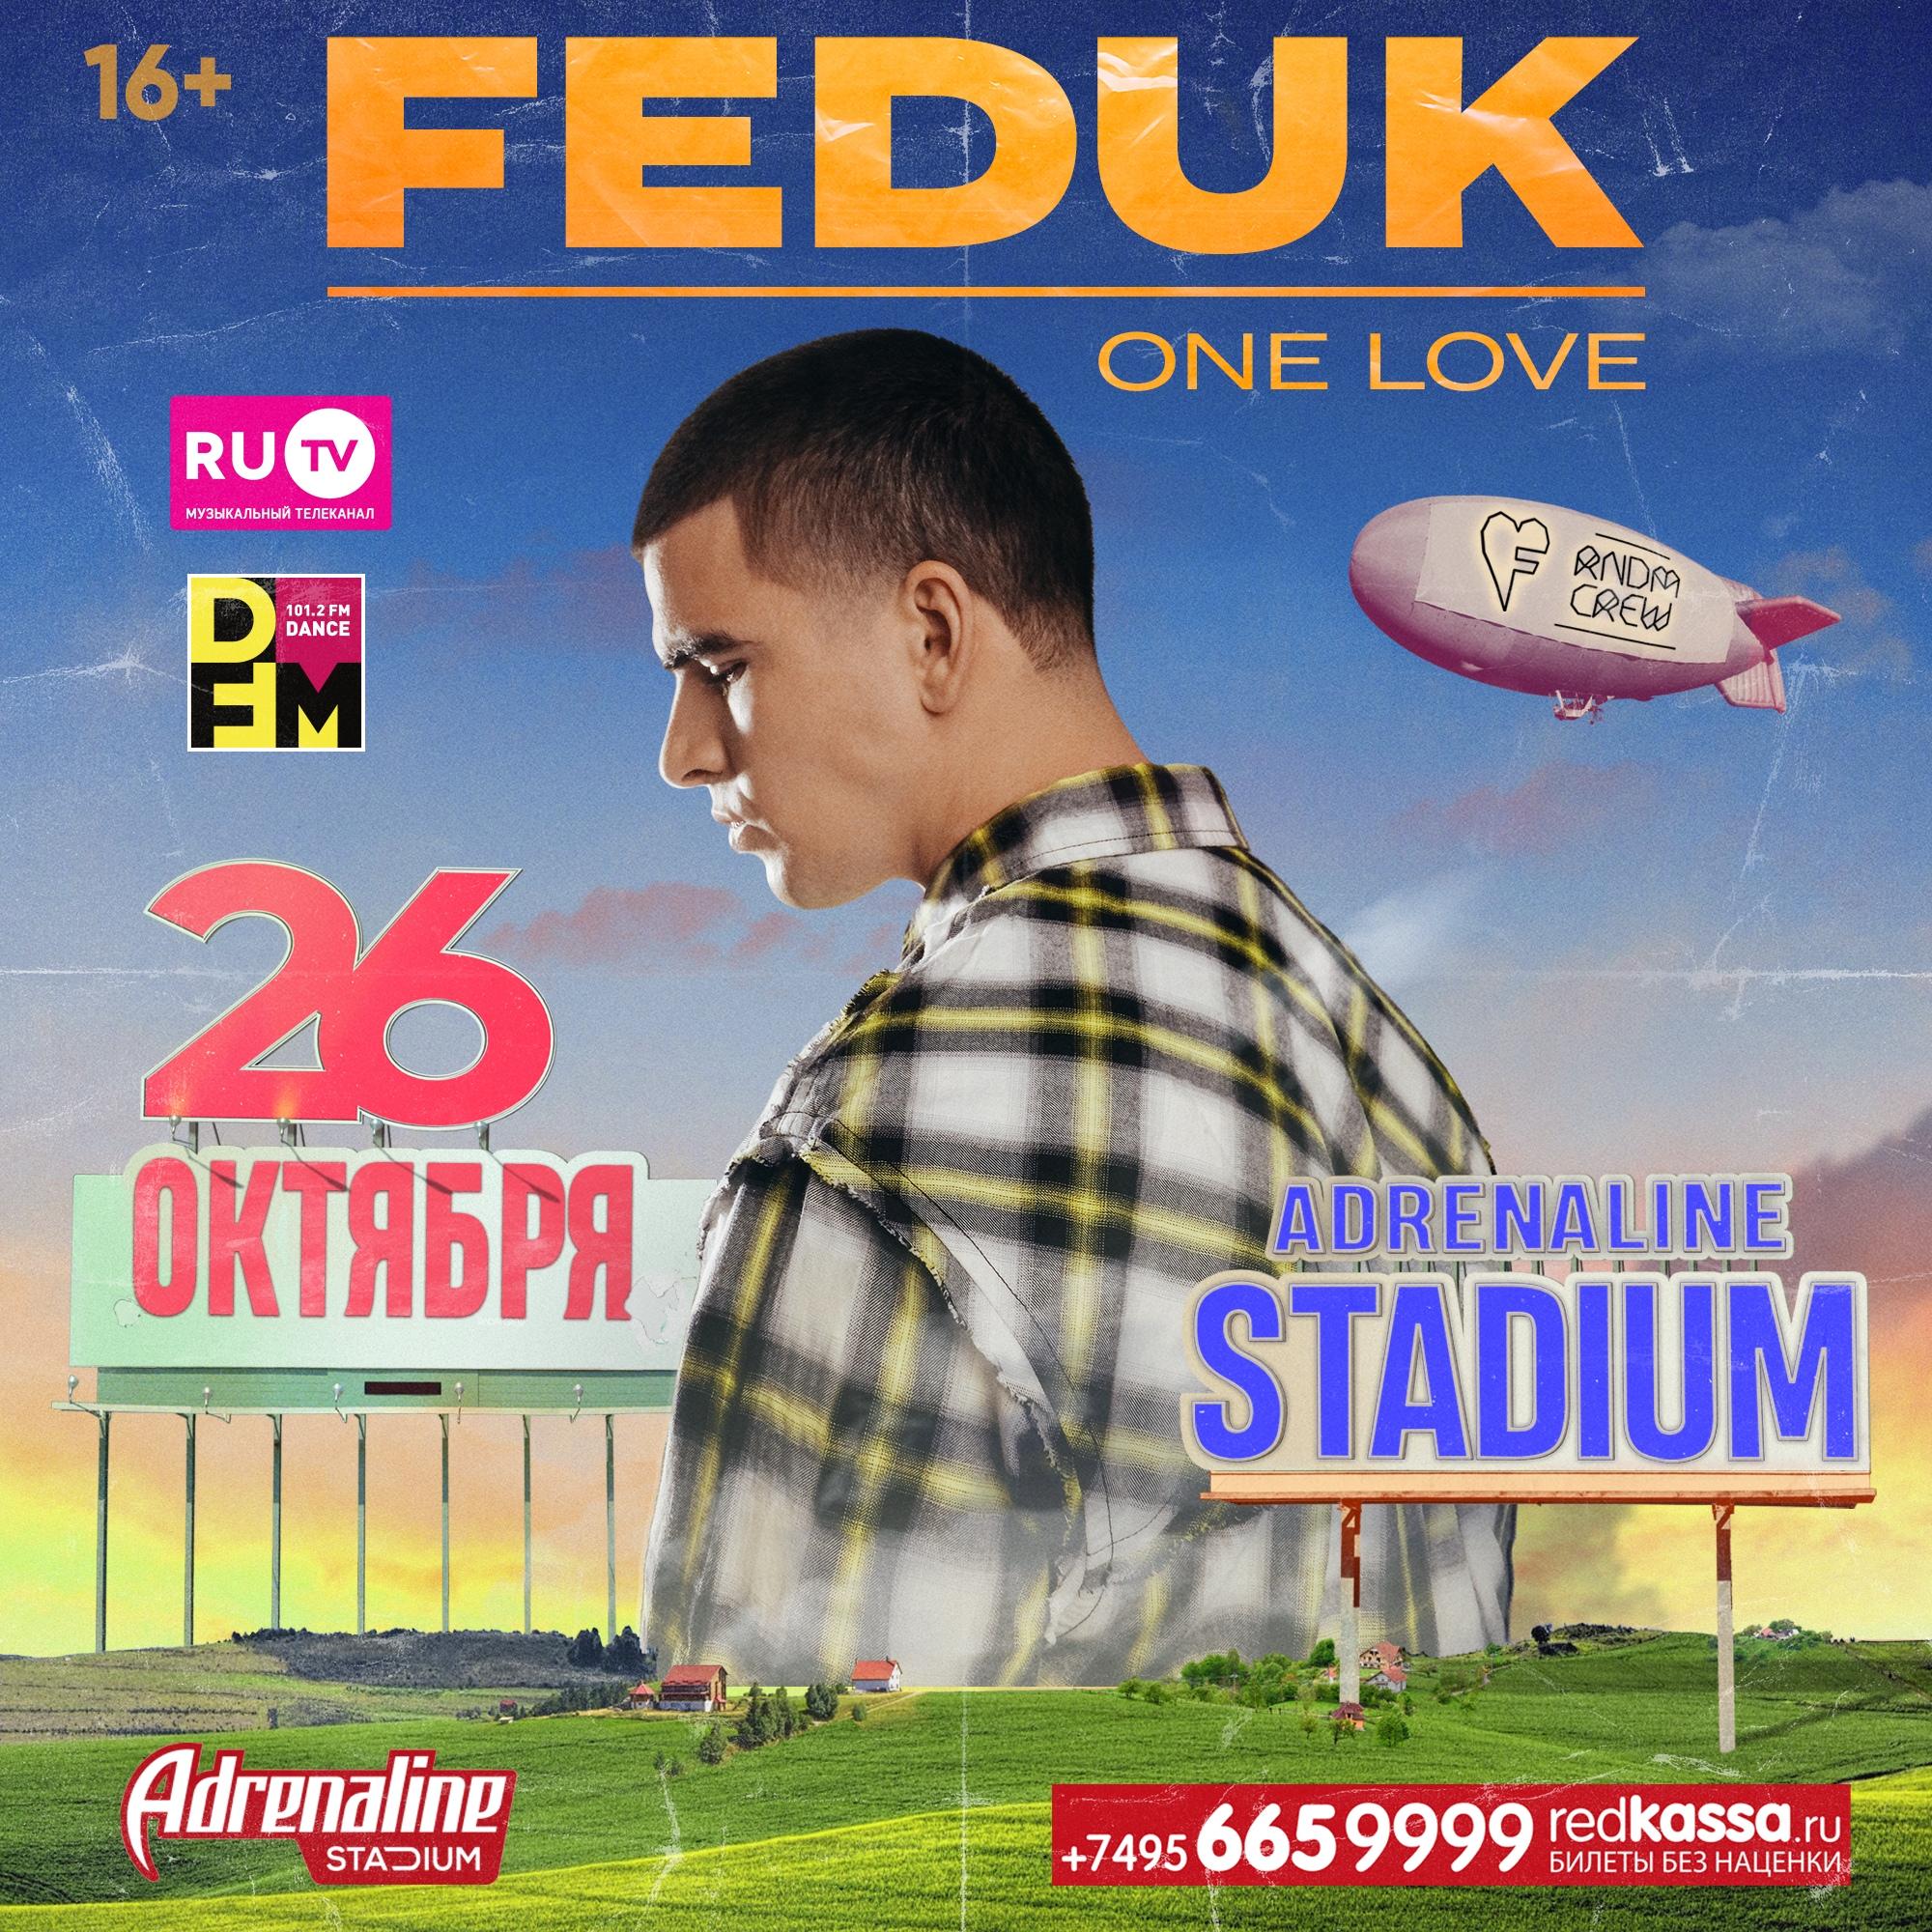 Feduk - 26 октября @ Stadium